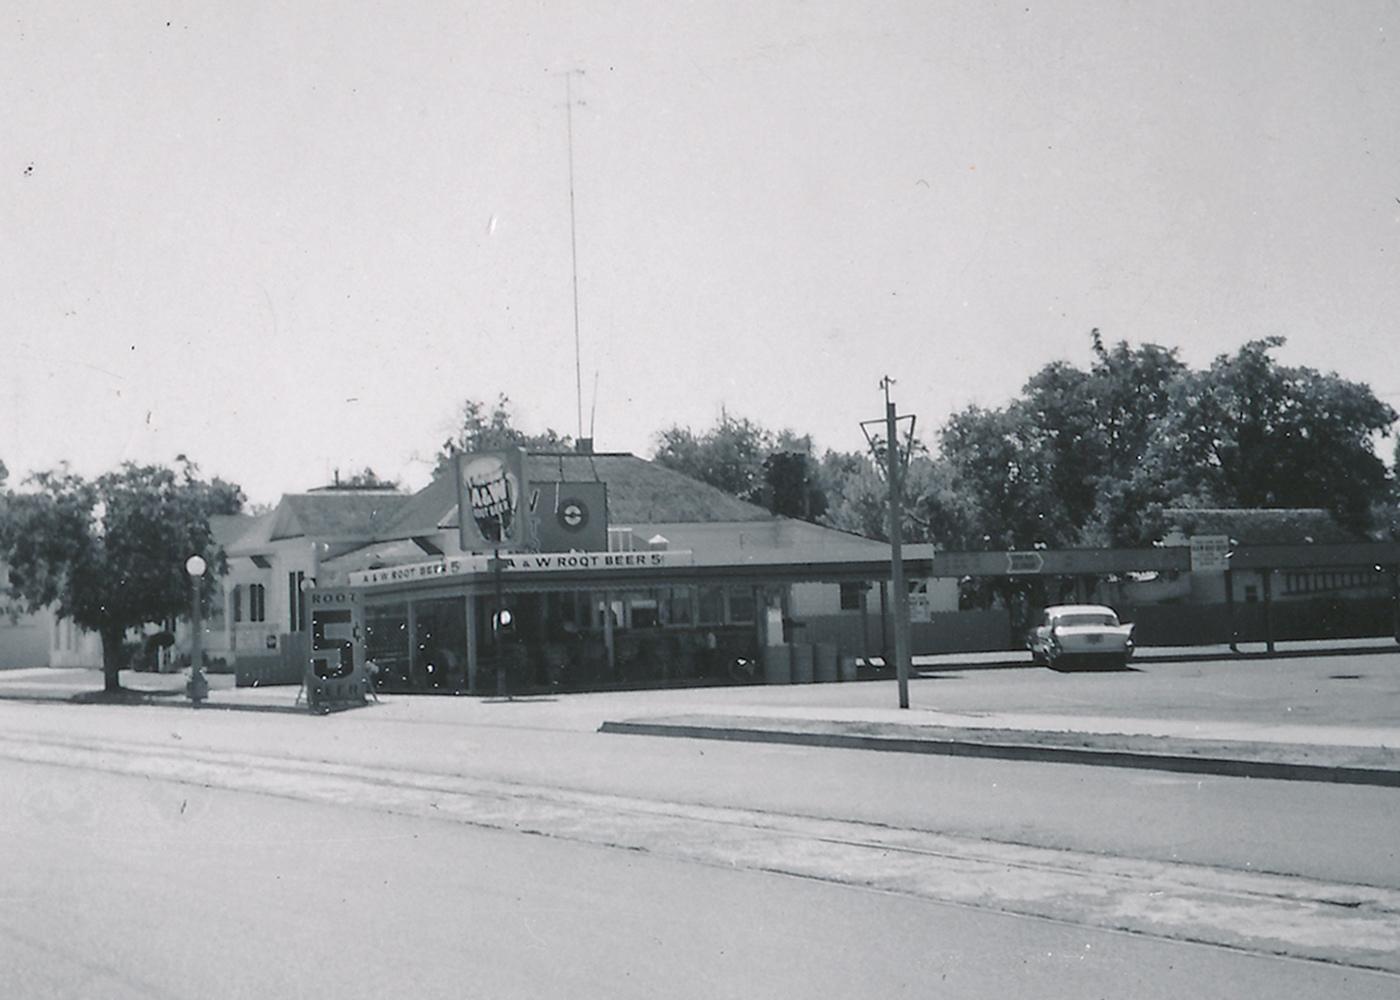 Black and white photo of A&W Restaurant in Lodi, California